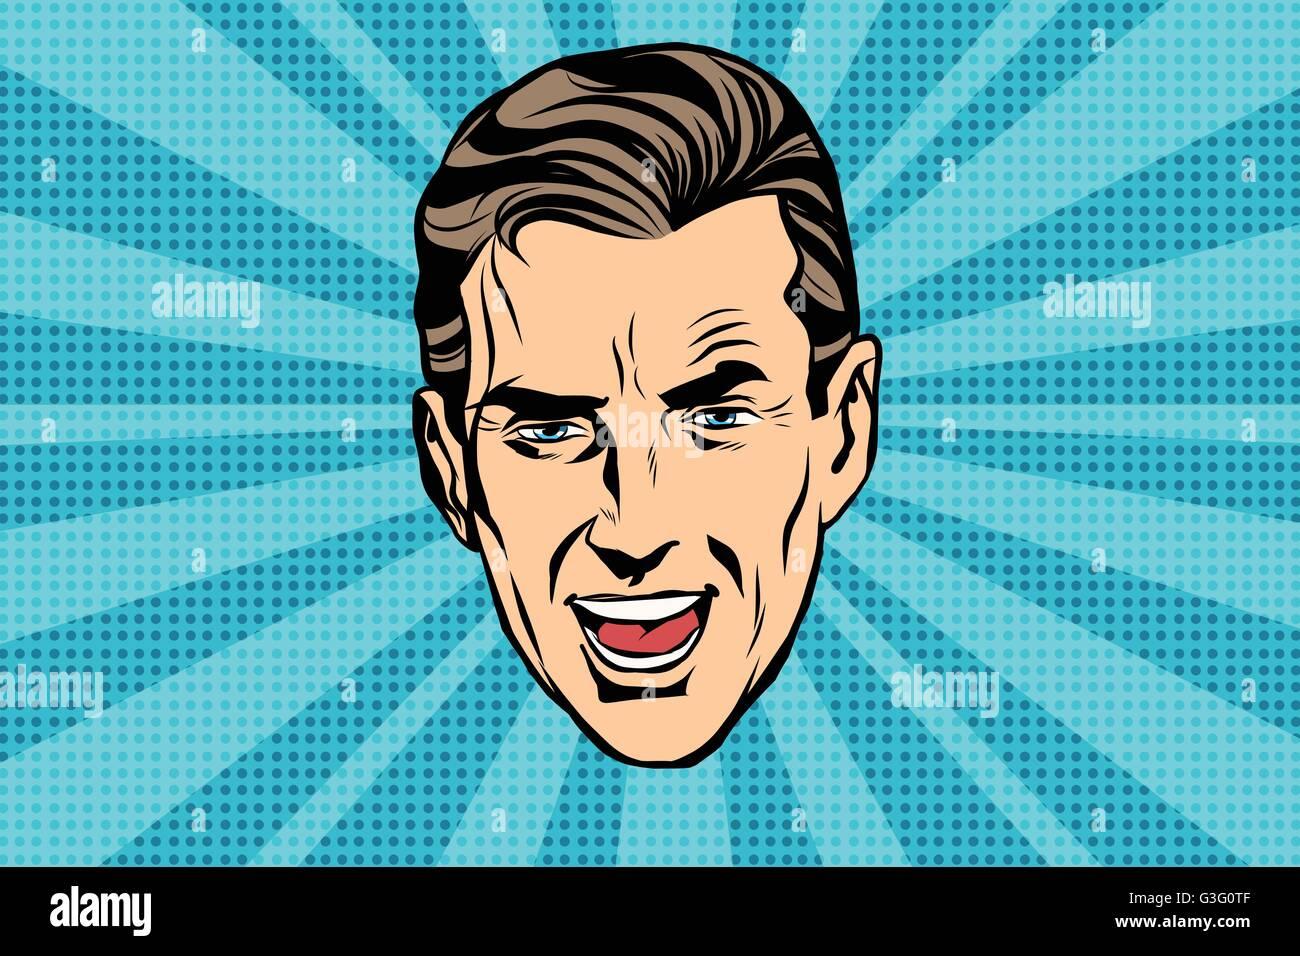 retro head man pop art poster - Stock Vector